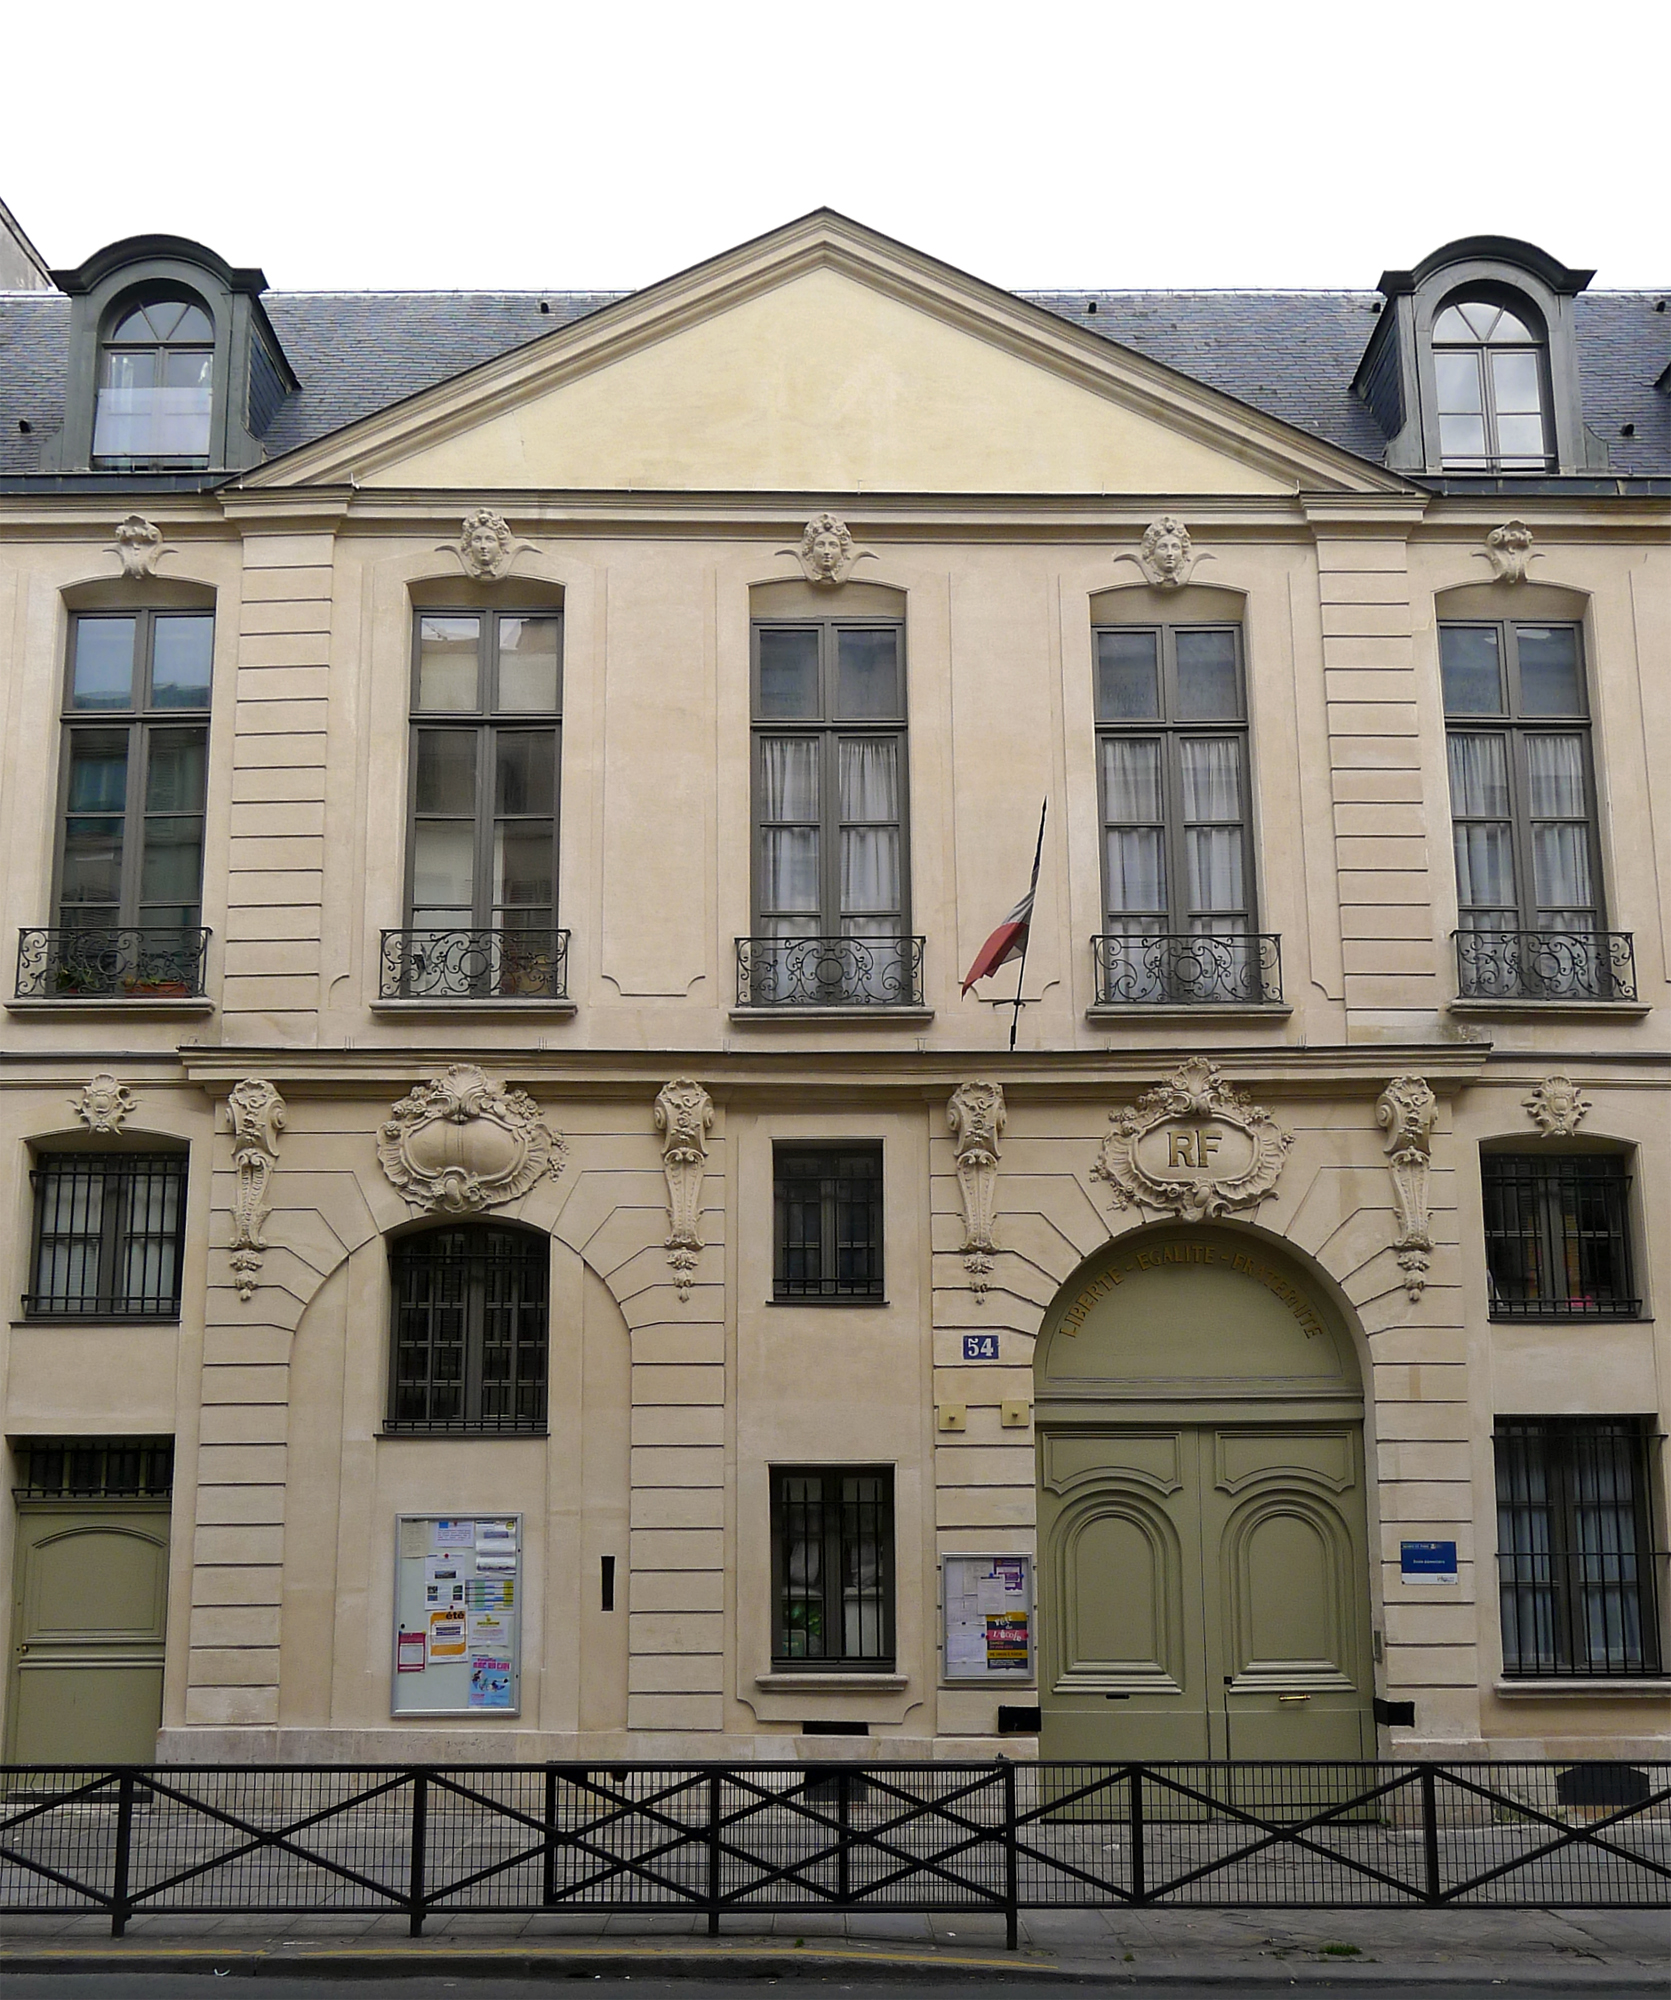 File:P1190636 Paris III rue de Turenne n54 hotel de Gourgues rwk.jpg ...